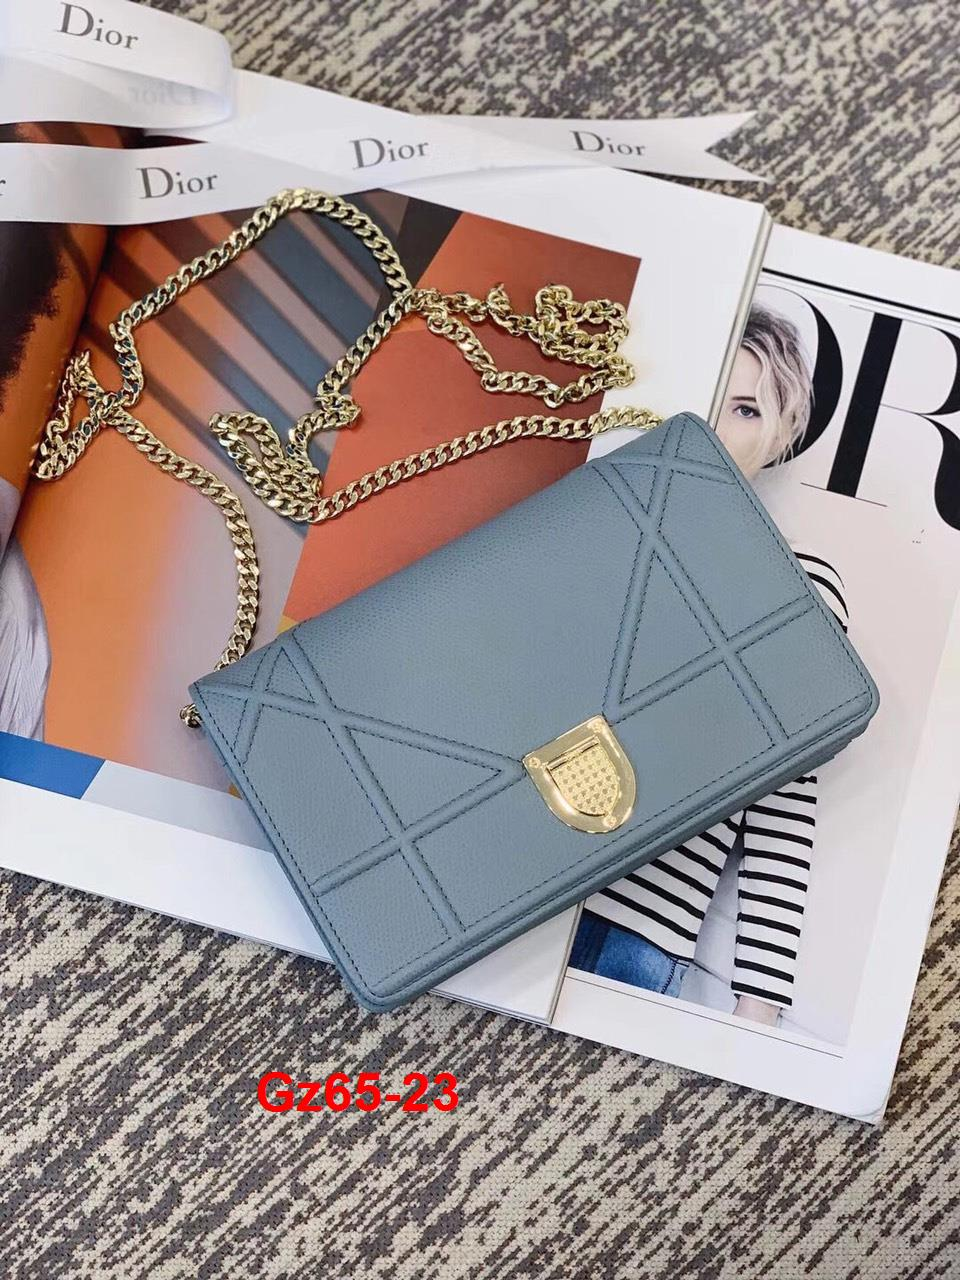 Gz65-23 Dior túi size 19cm siêu cấp